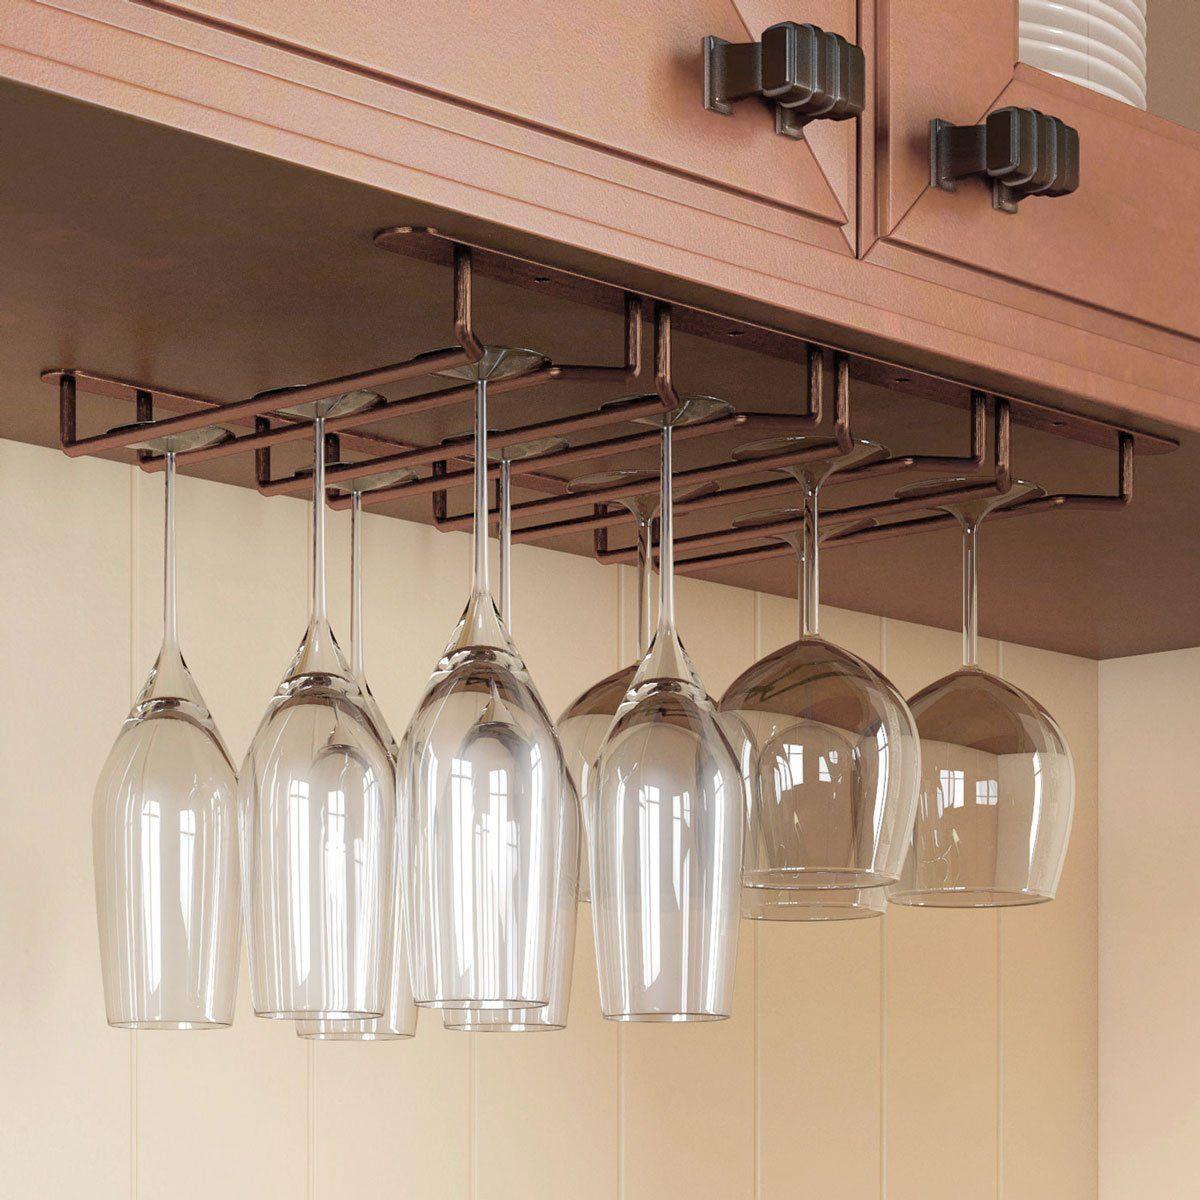 DIY Wine Glass Rack Under Cabinet  Amazon Rack and Hook Stemware Glass Rack Under